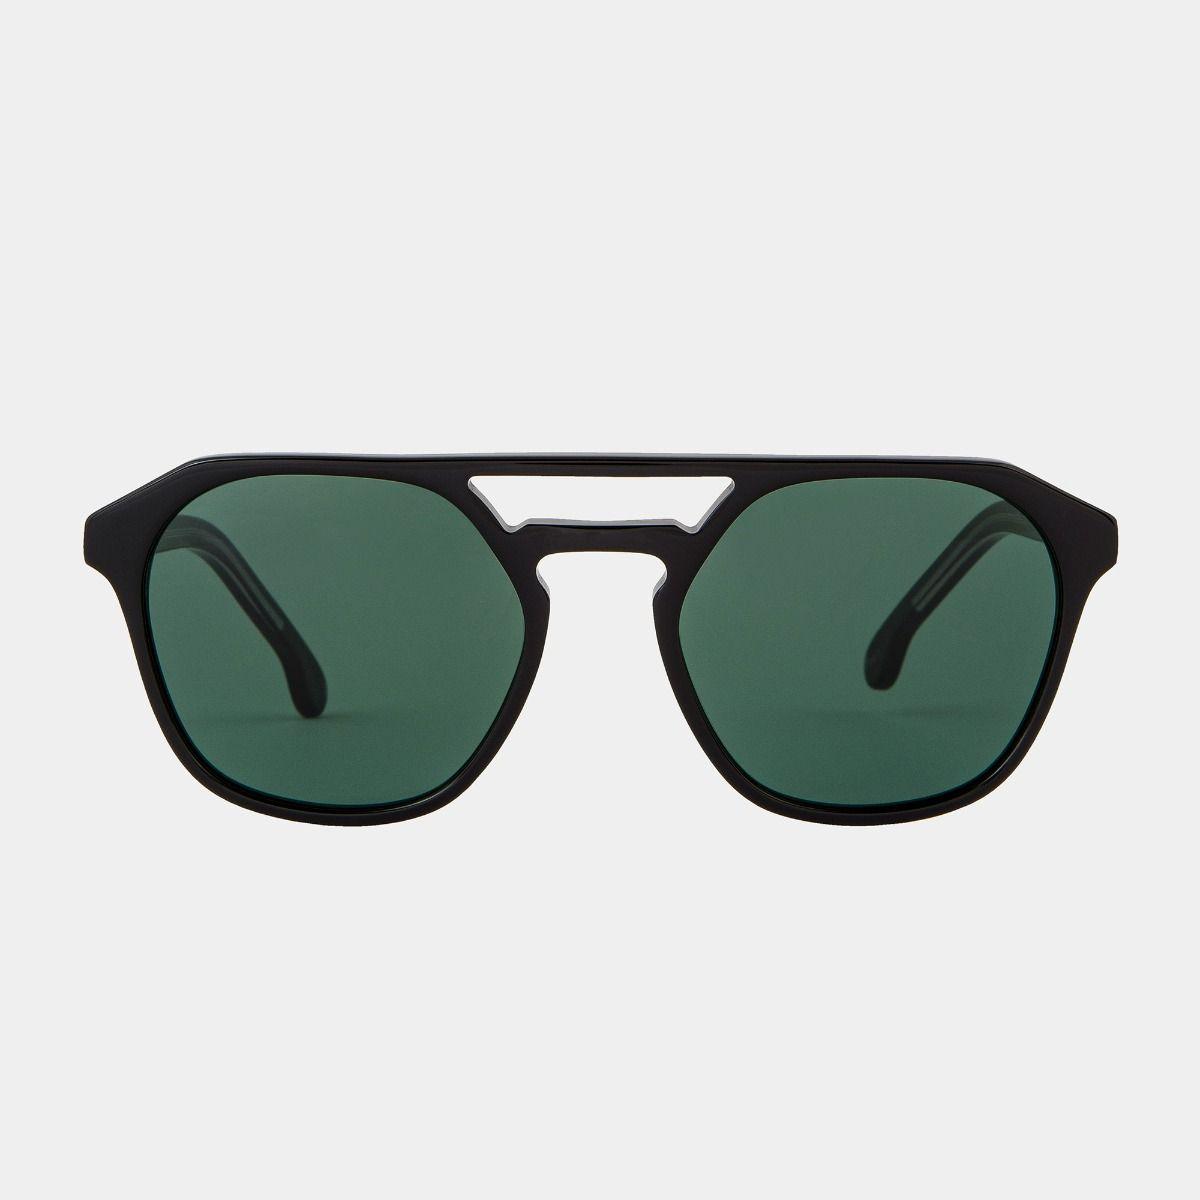 Paul Smith Barford Aviator Sunglasses